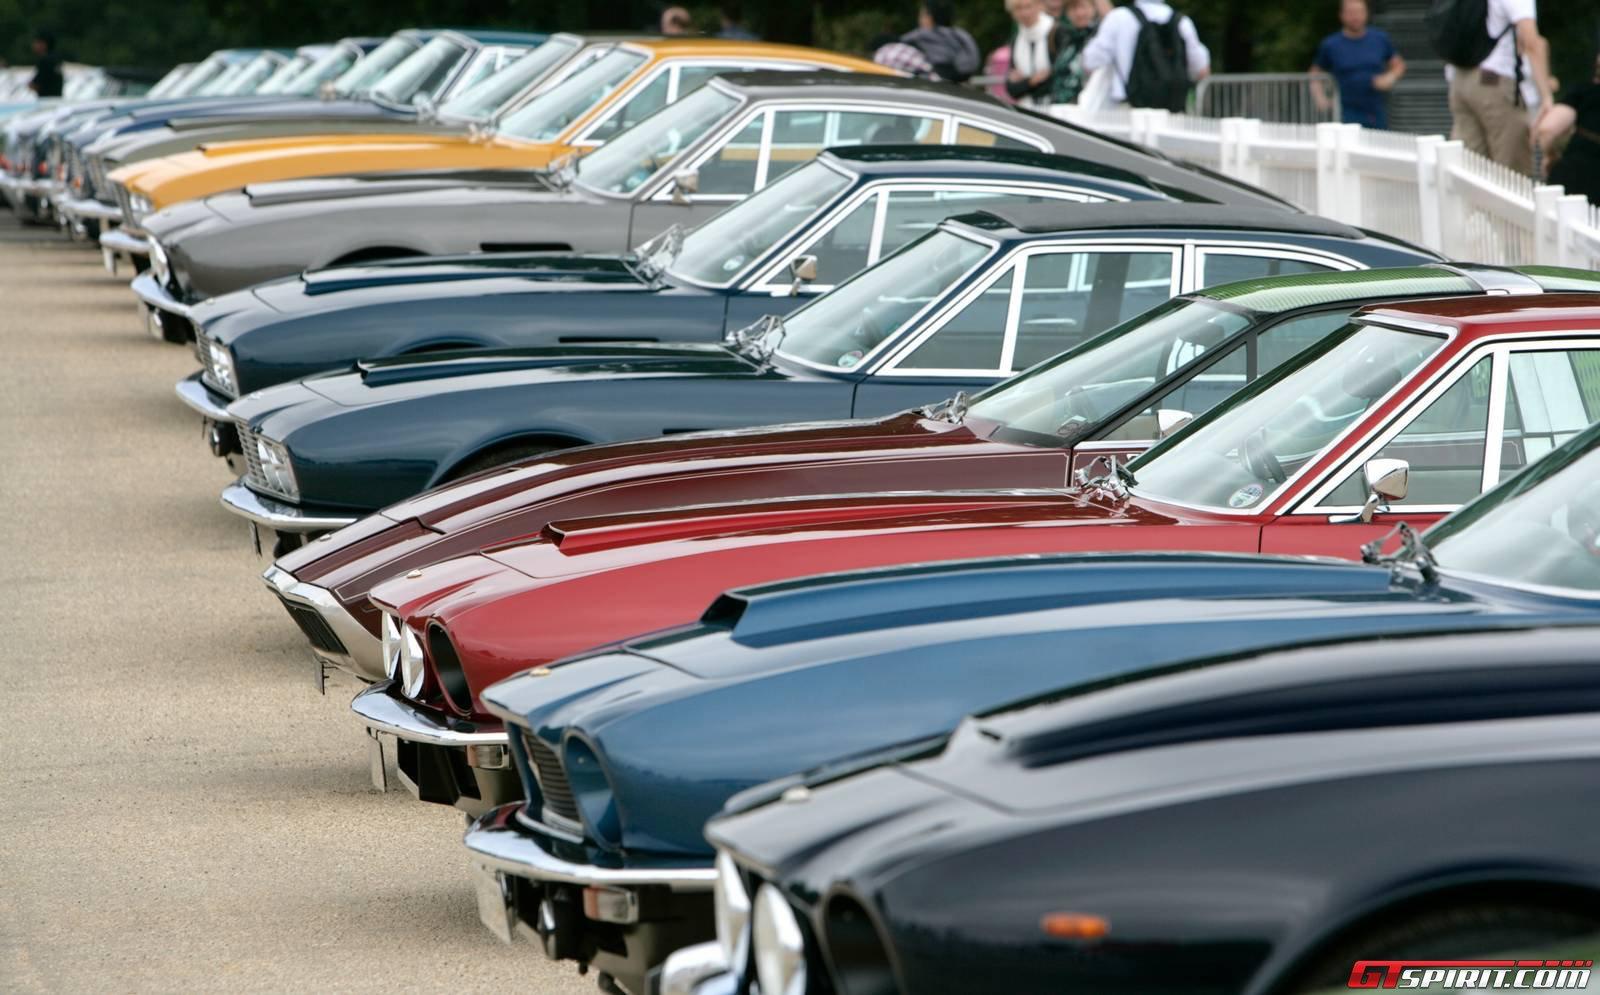 Aston Martin kỷ niệm 100 năm ra đời